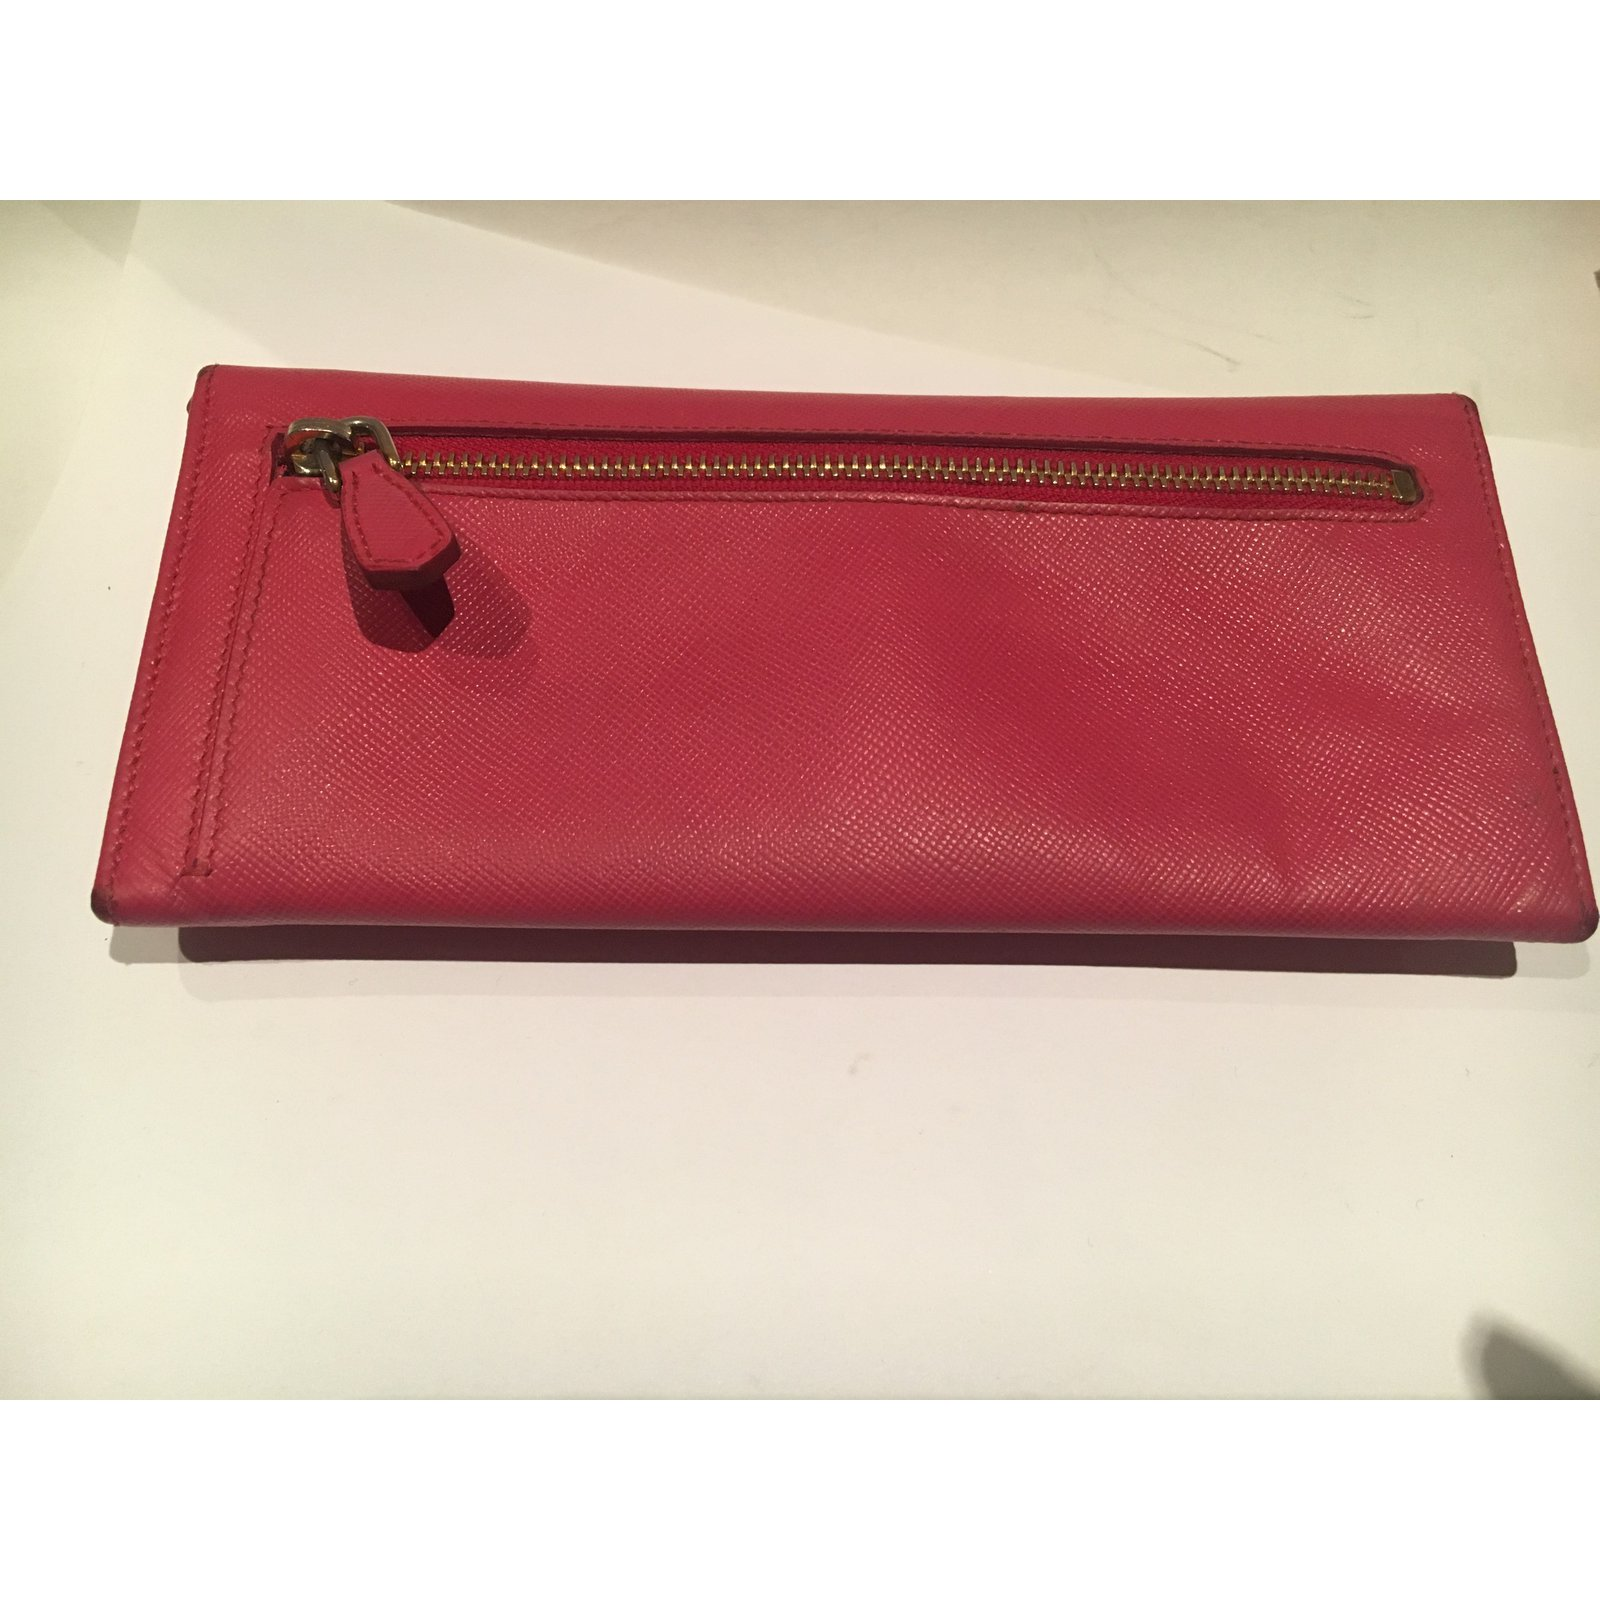 c53fa0baf8bea9 Prada Purse Wallets Leather Pink ref.31439 - Joli Closet